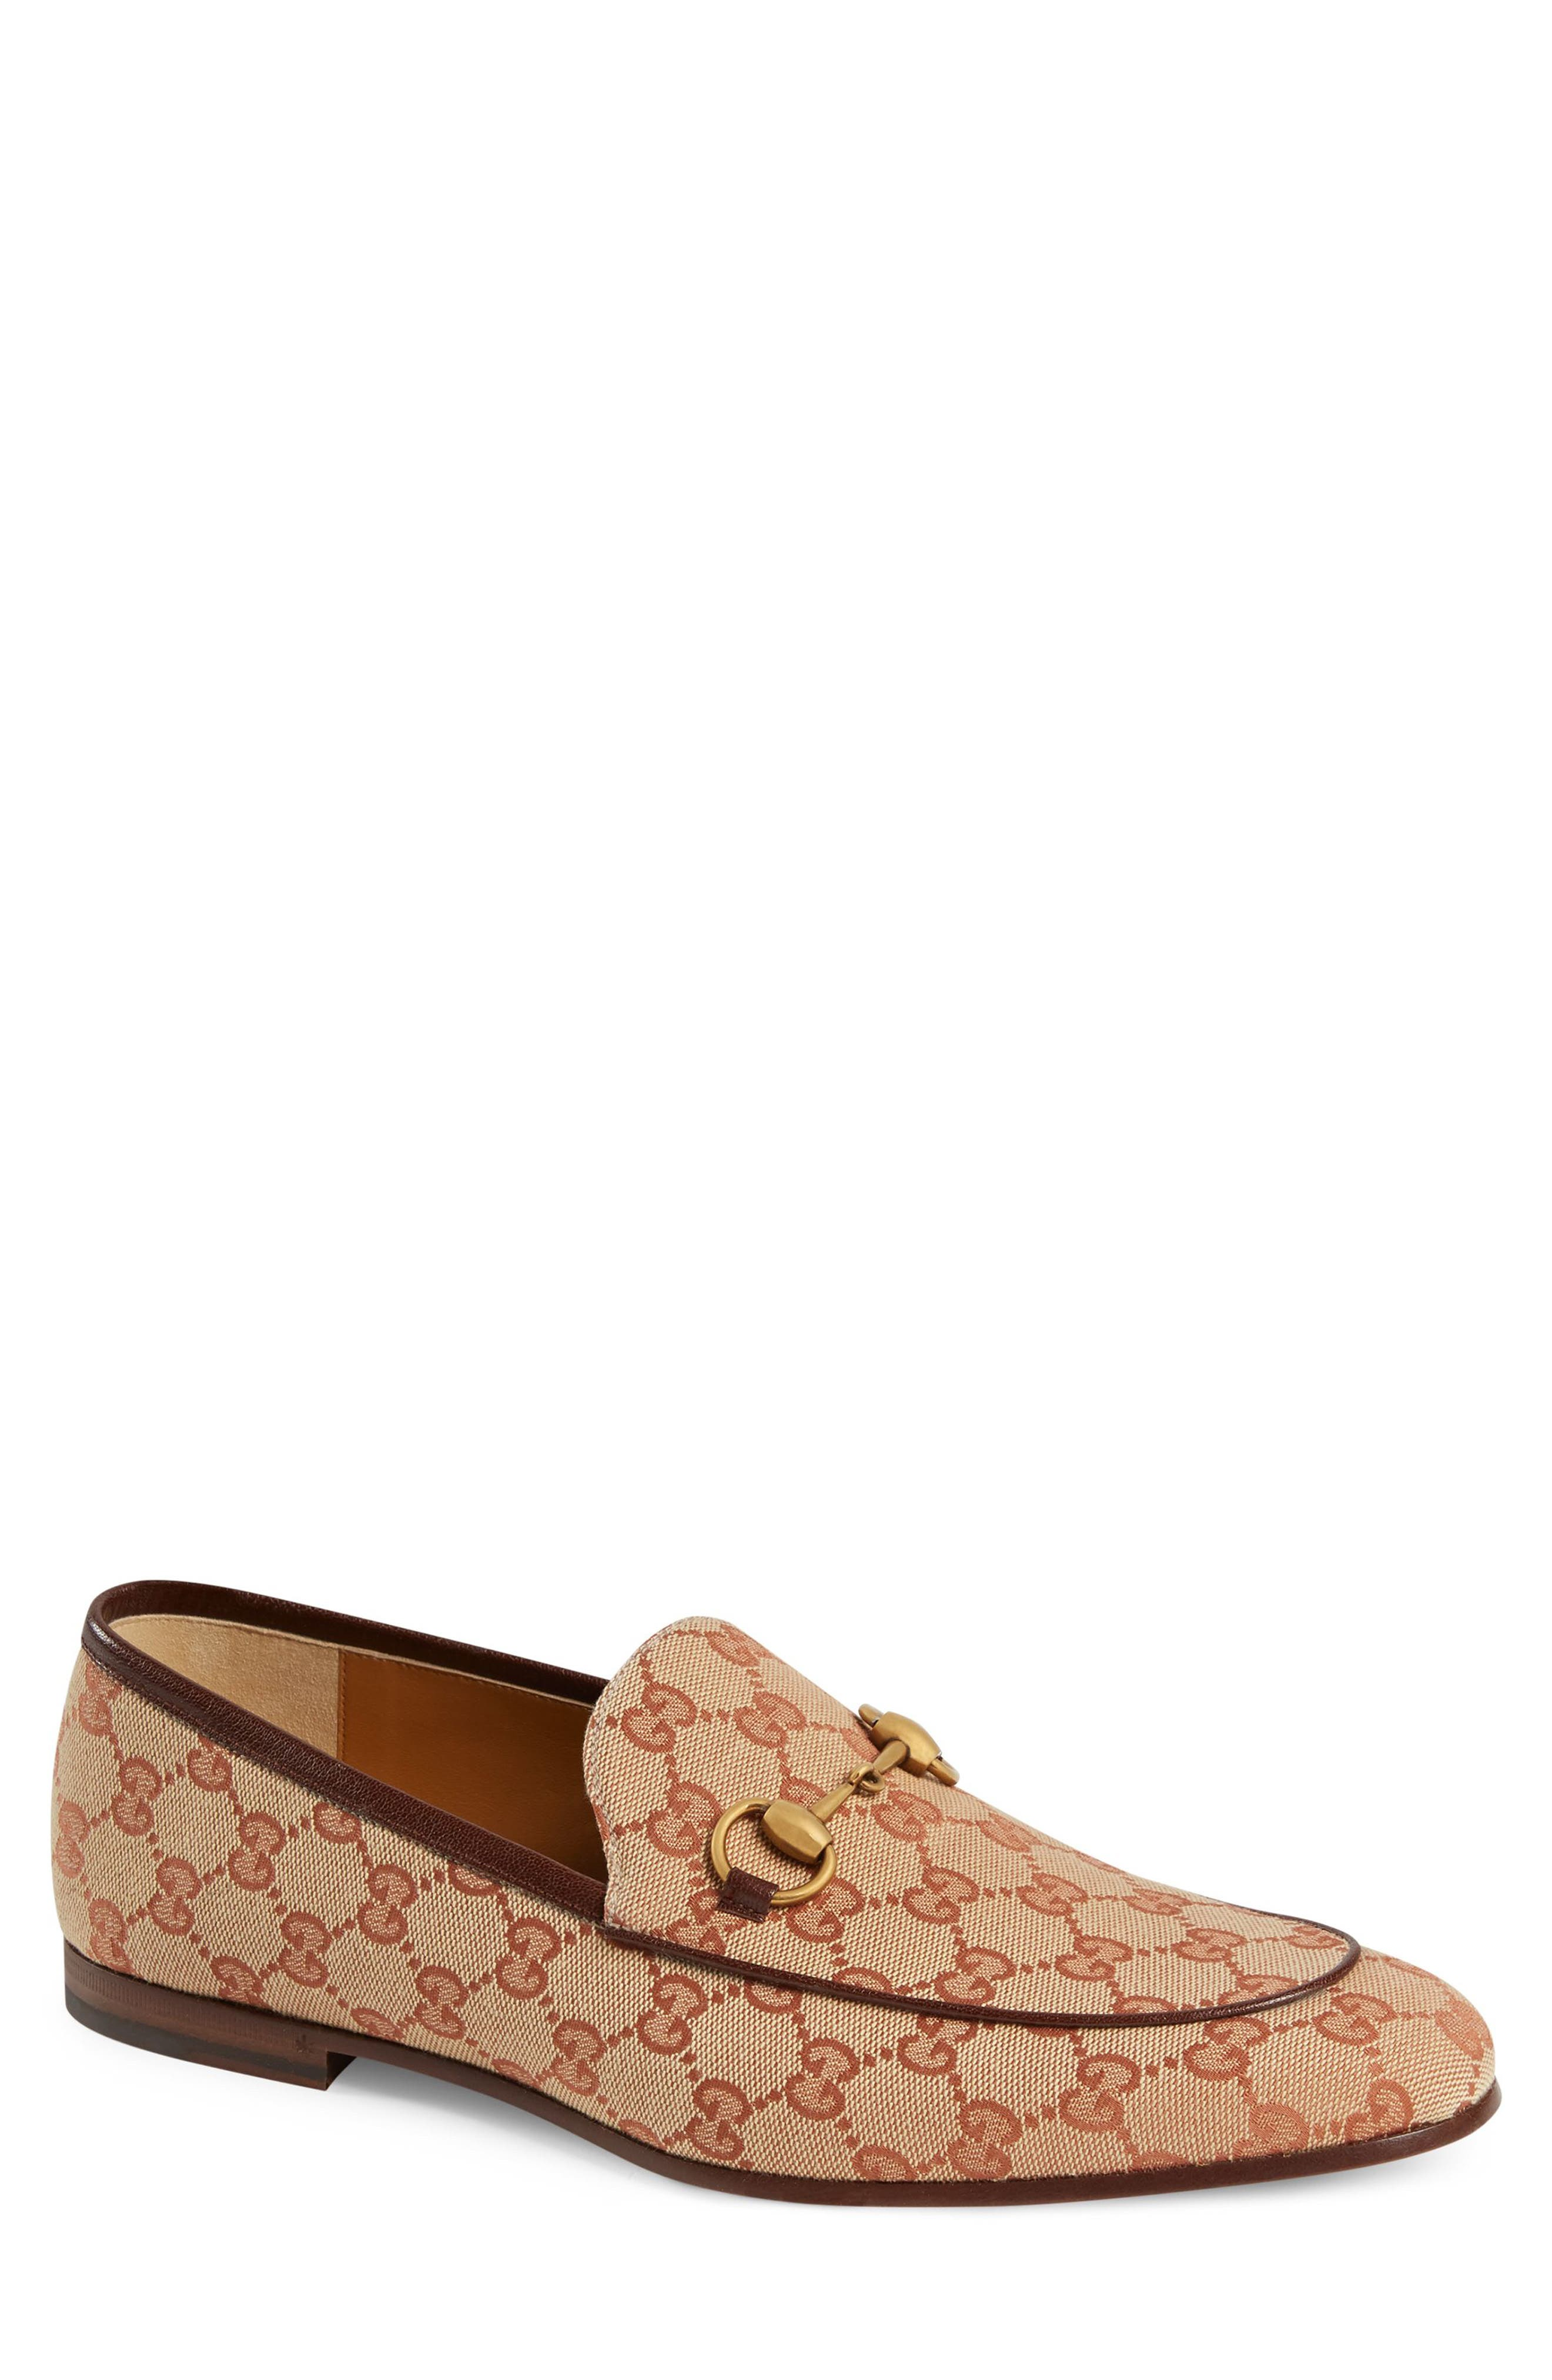 1950s Mens Shoes: Saddle Shoes, Boots, Greaser, Rockabilly Mens Gucci Jodraan Gg Canvas Loafer $695.00 AT vintagedancer.com